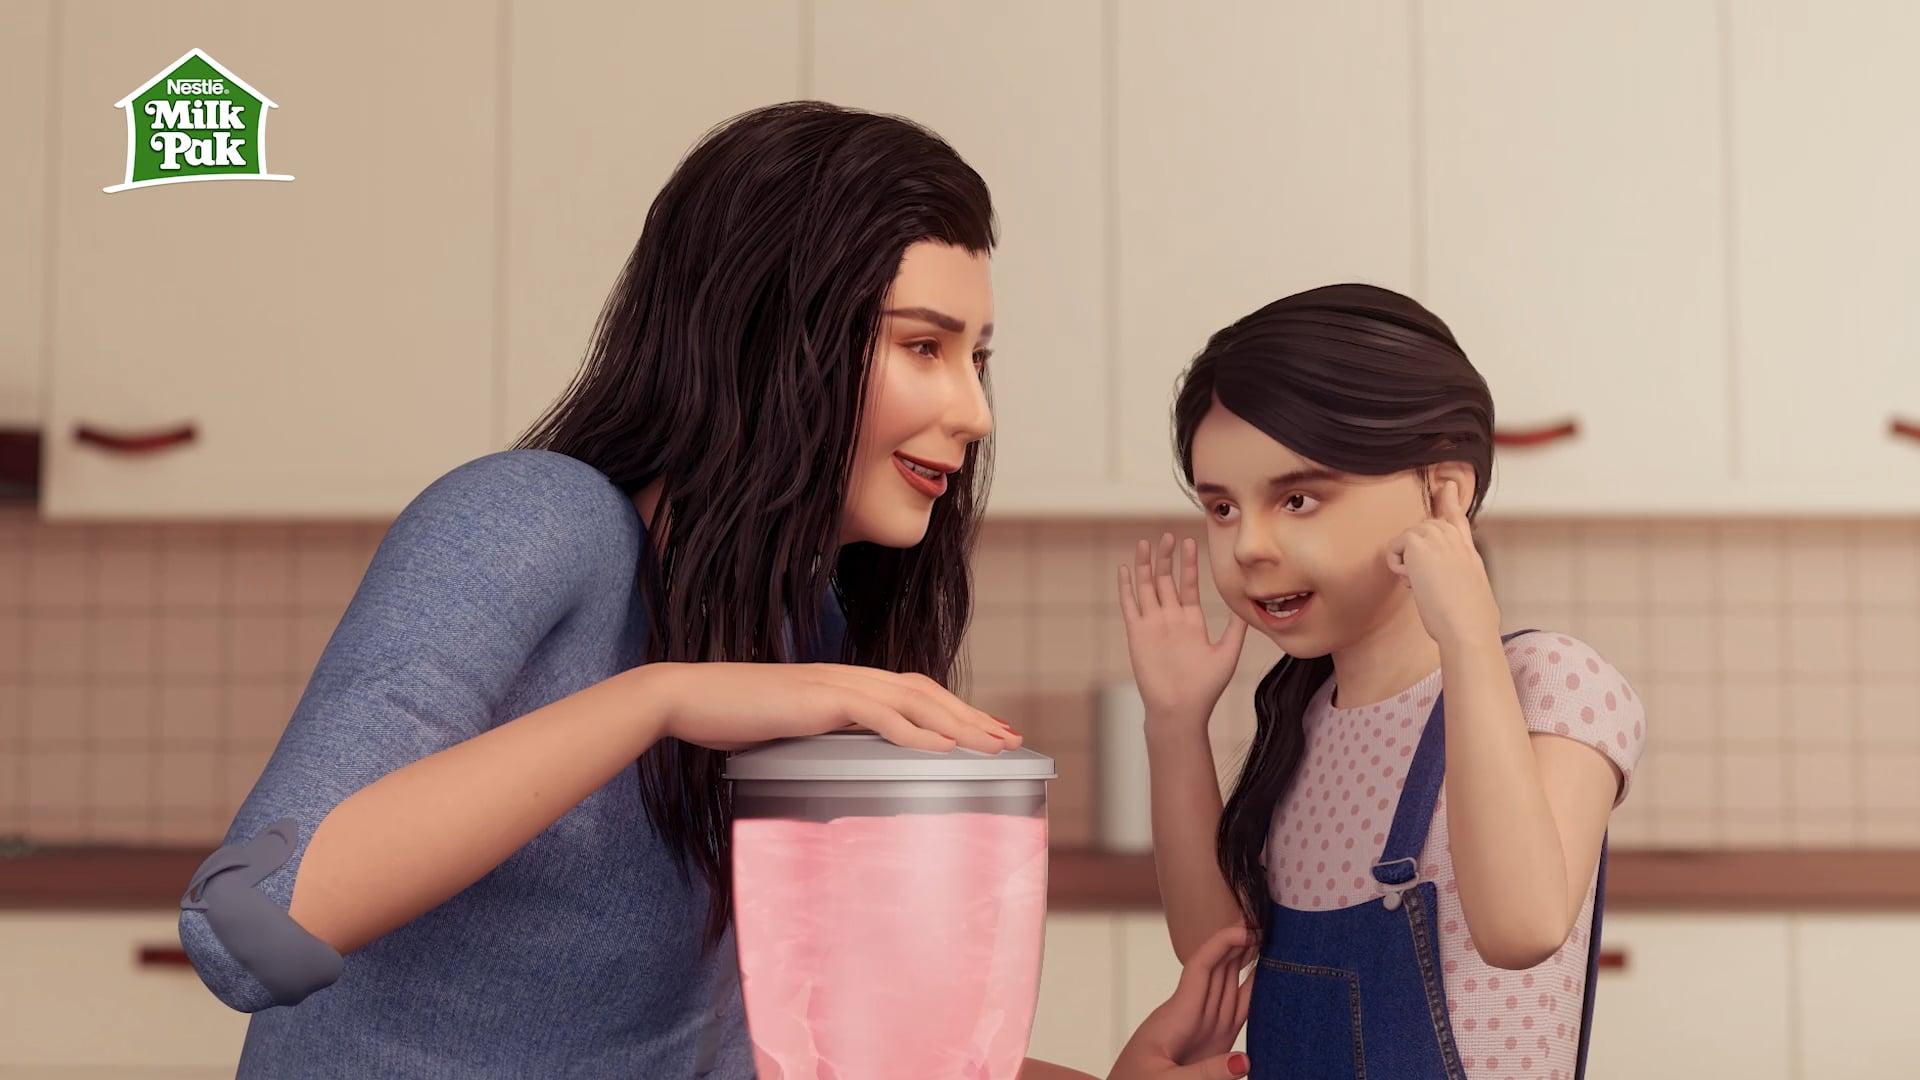 Nestle MilkPak A2 - 3D Animatics